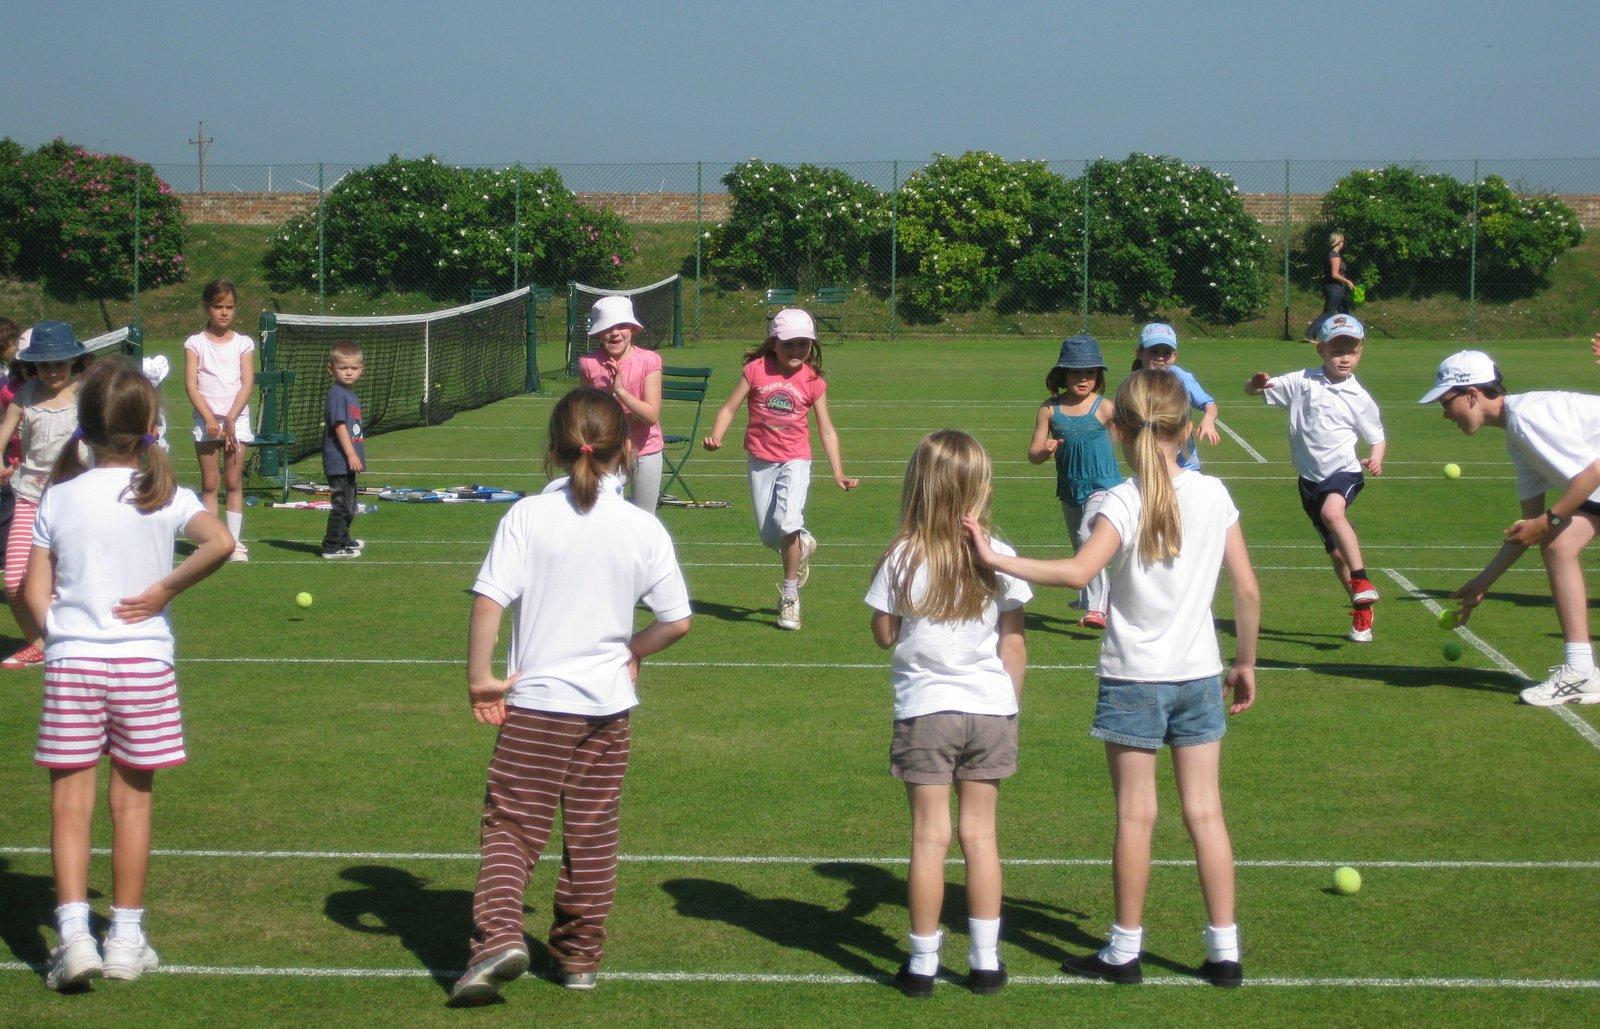 http://www.ryetennisandsquashclub.org.uk/wp-content/uploads/2019/04/KidsCoaching.jpeg